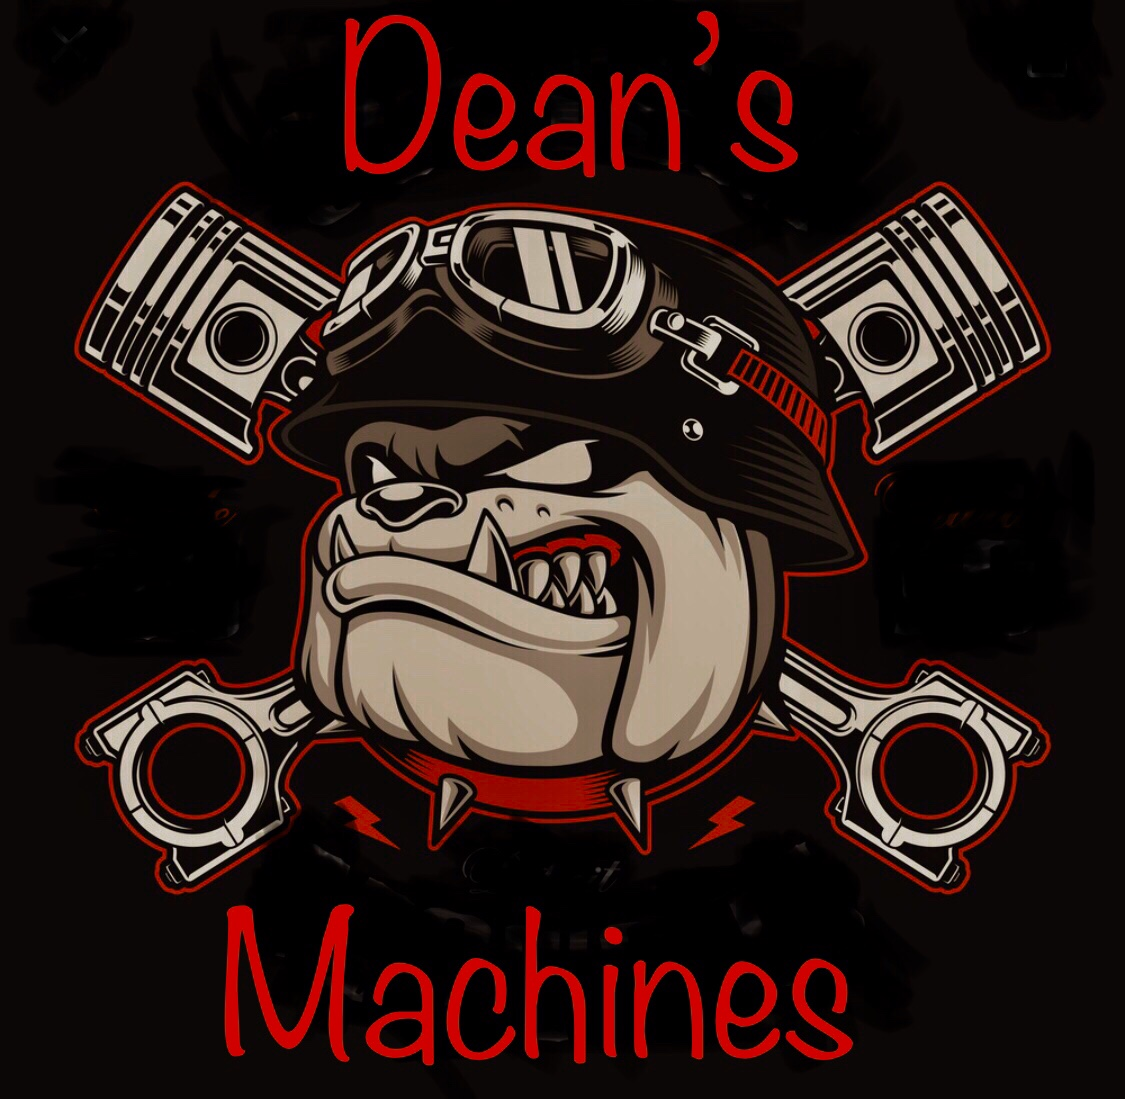 Deans Machines logo